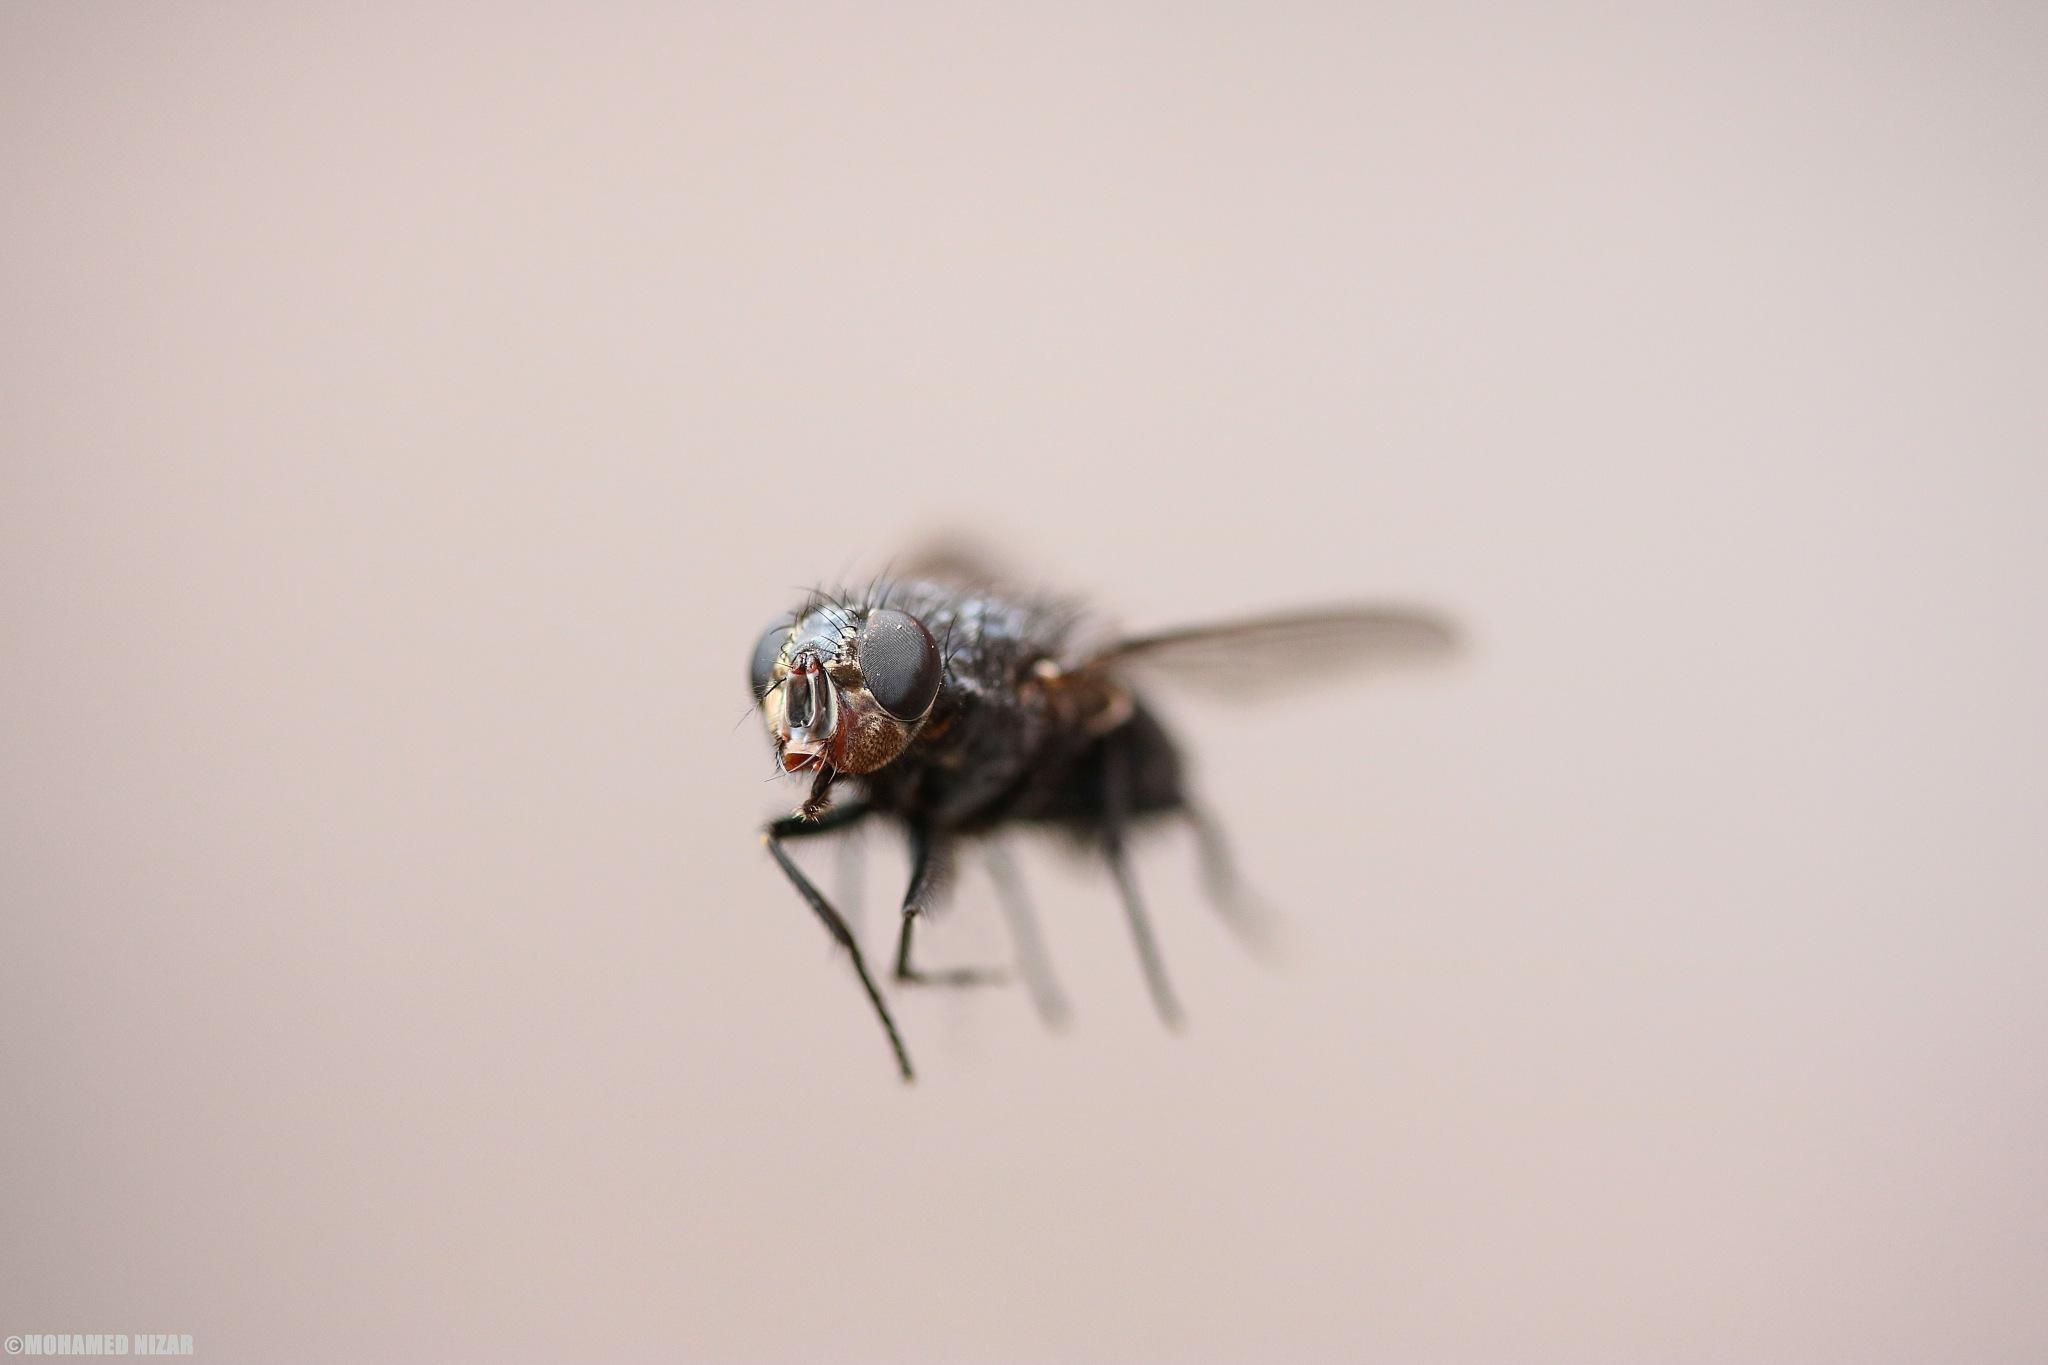 Fly by Mohamed Nizar Photography